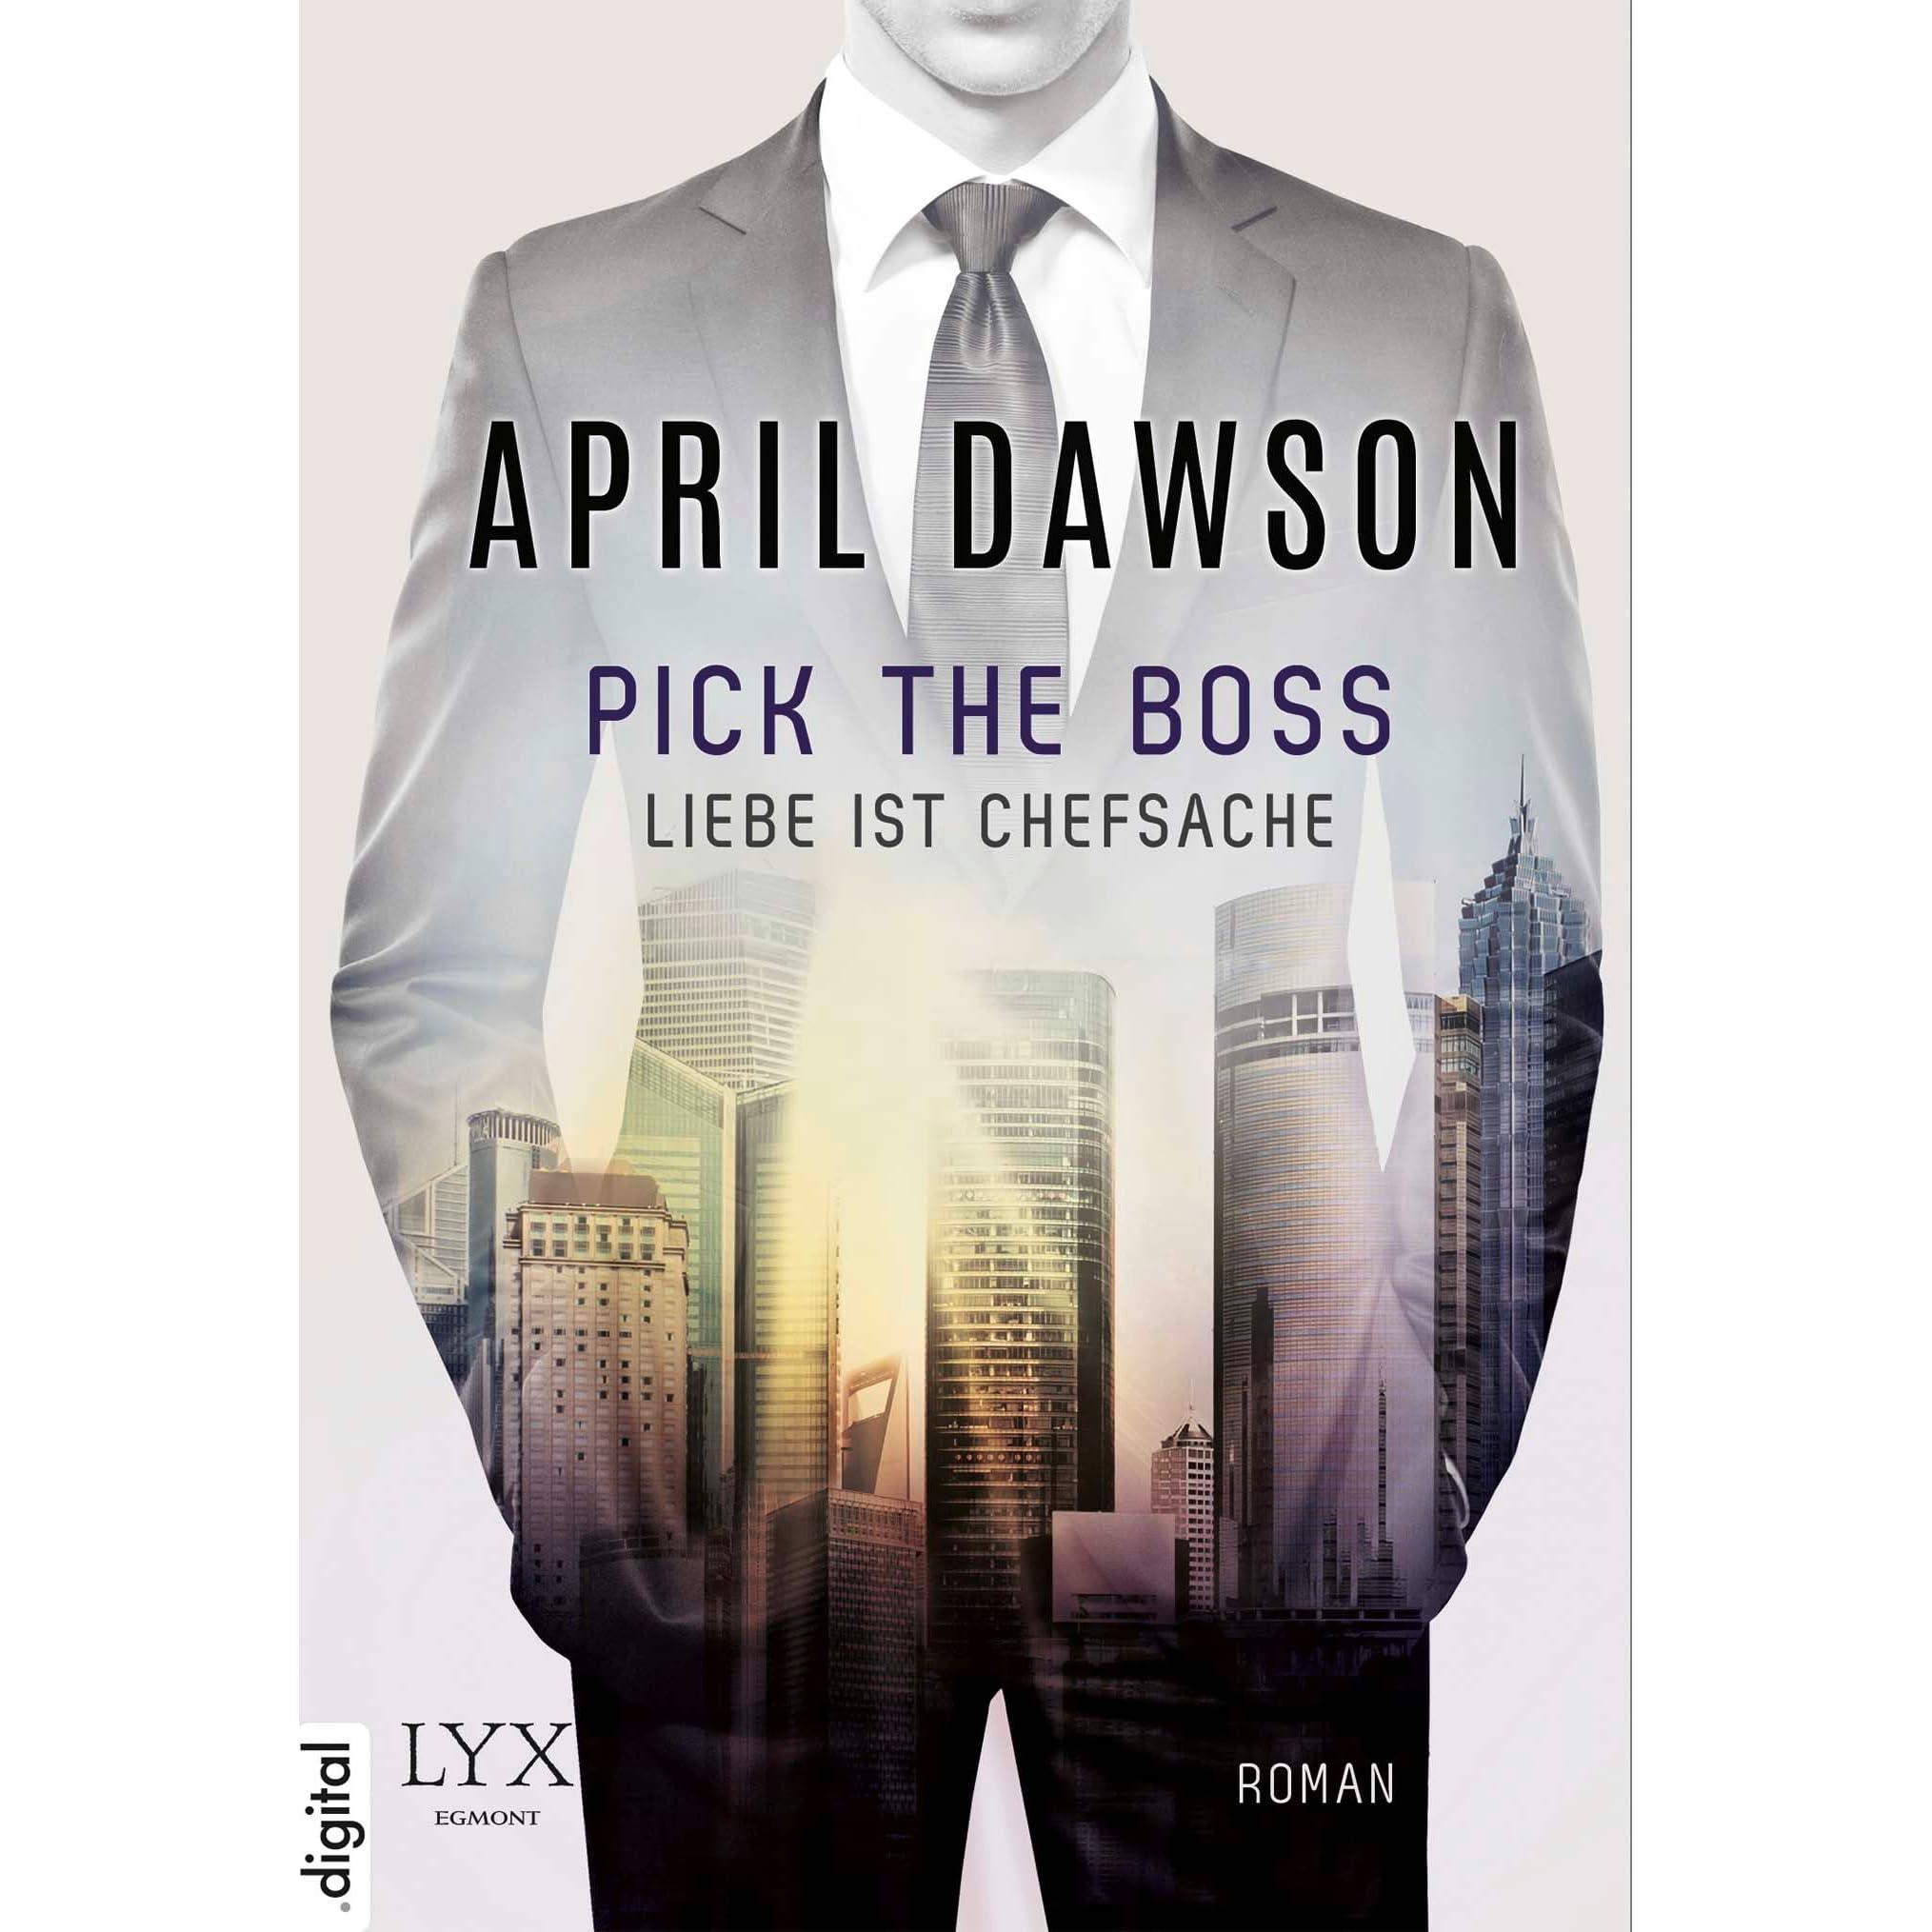 Pick the Boss – Liebe ist Chefsache by April Dawson